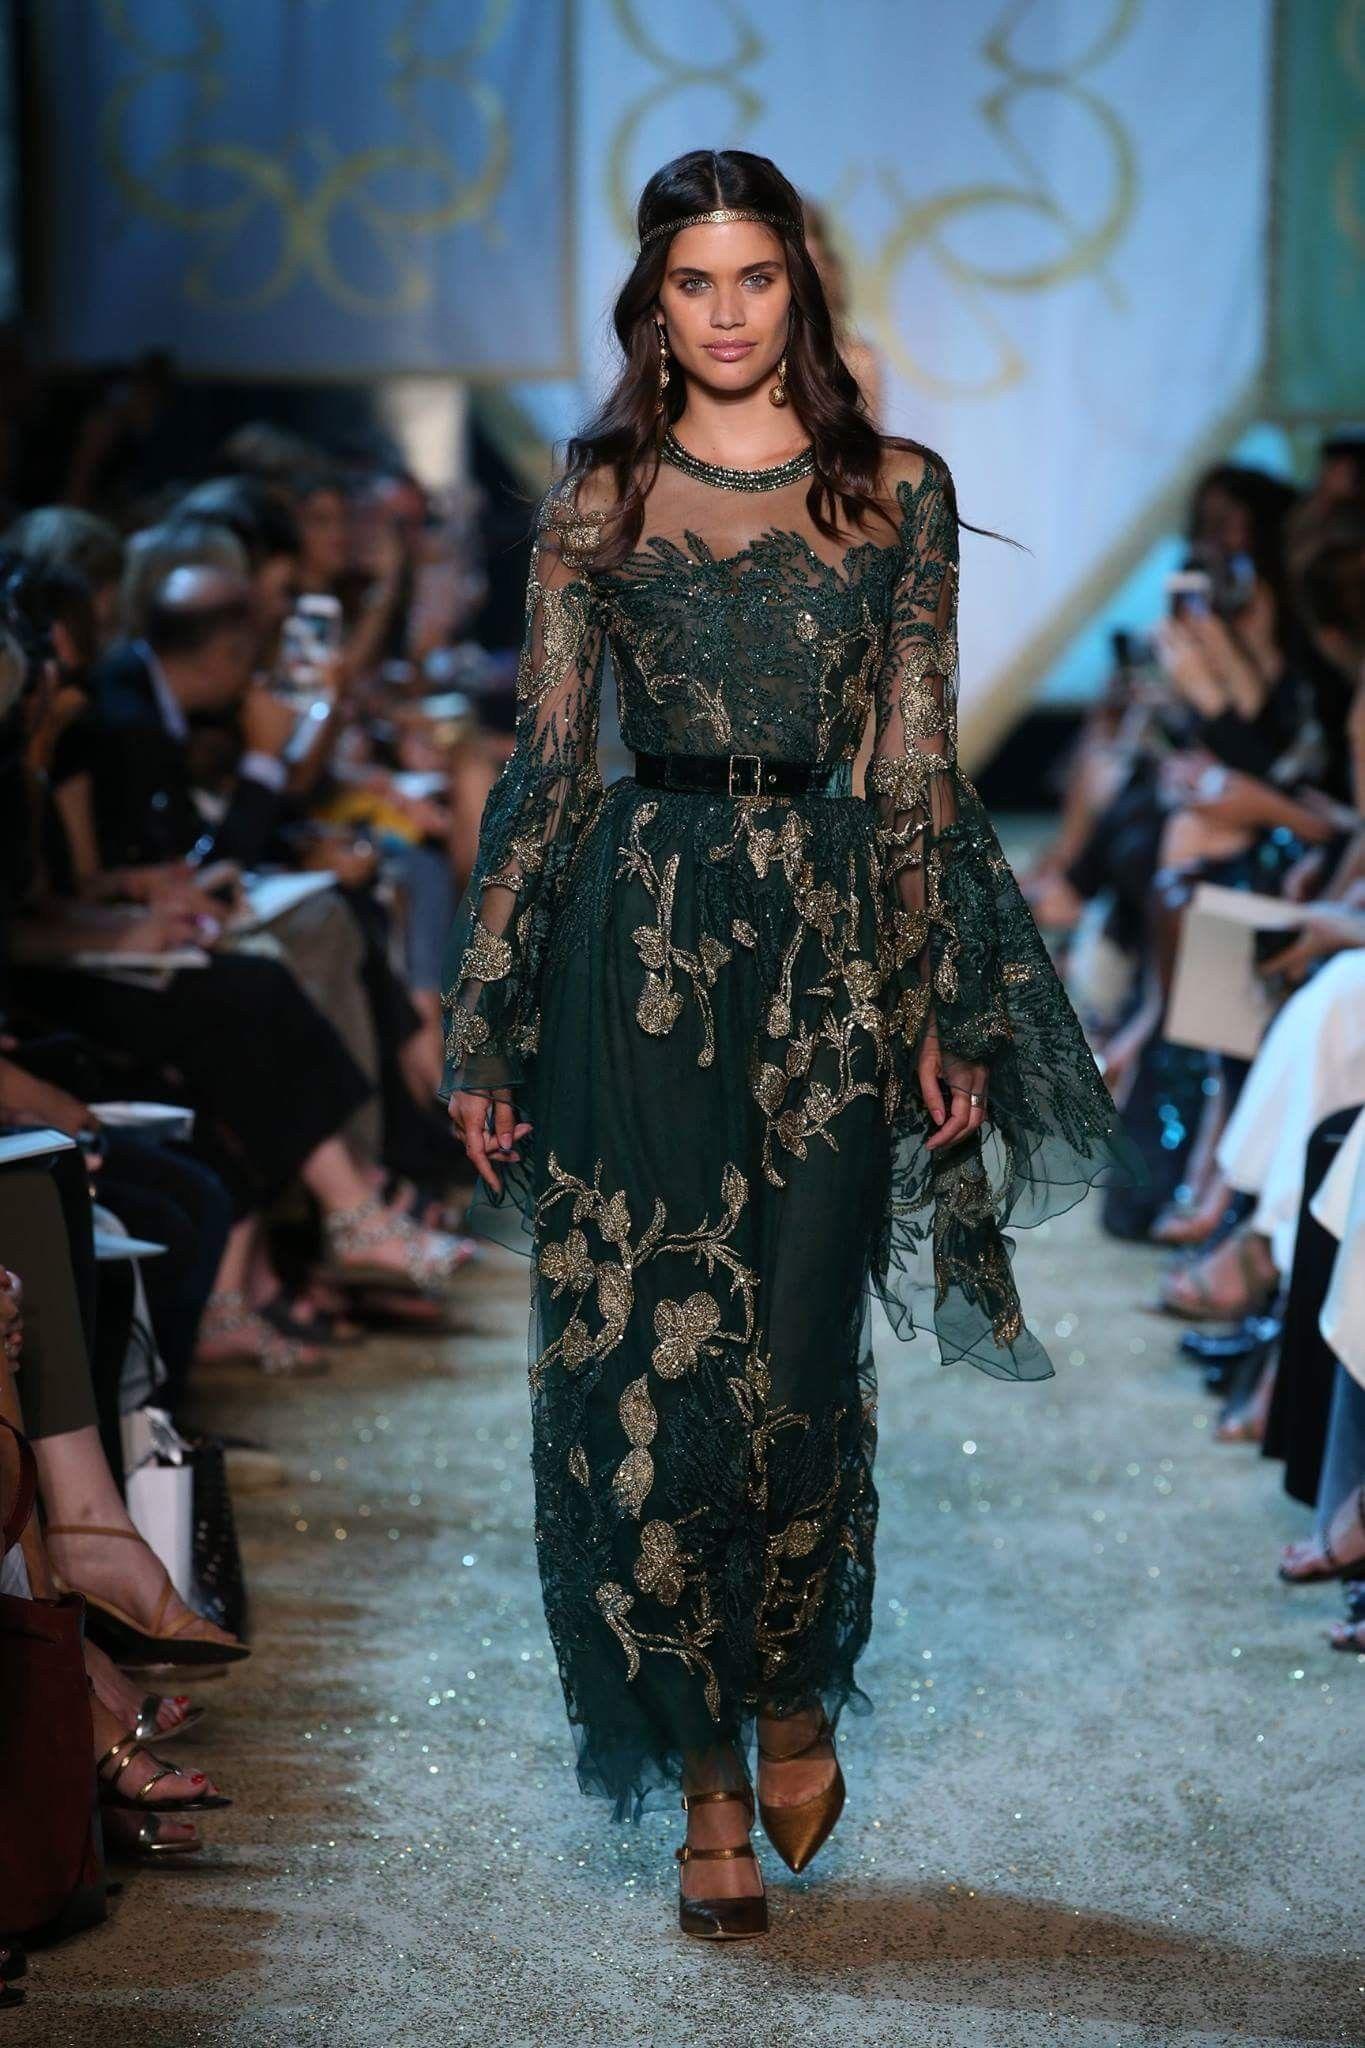 Elie Saab Haute Couture Fall 2017/18   DESIGNER GOWNS   Pinterest ...